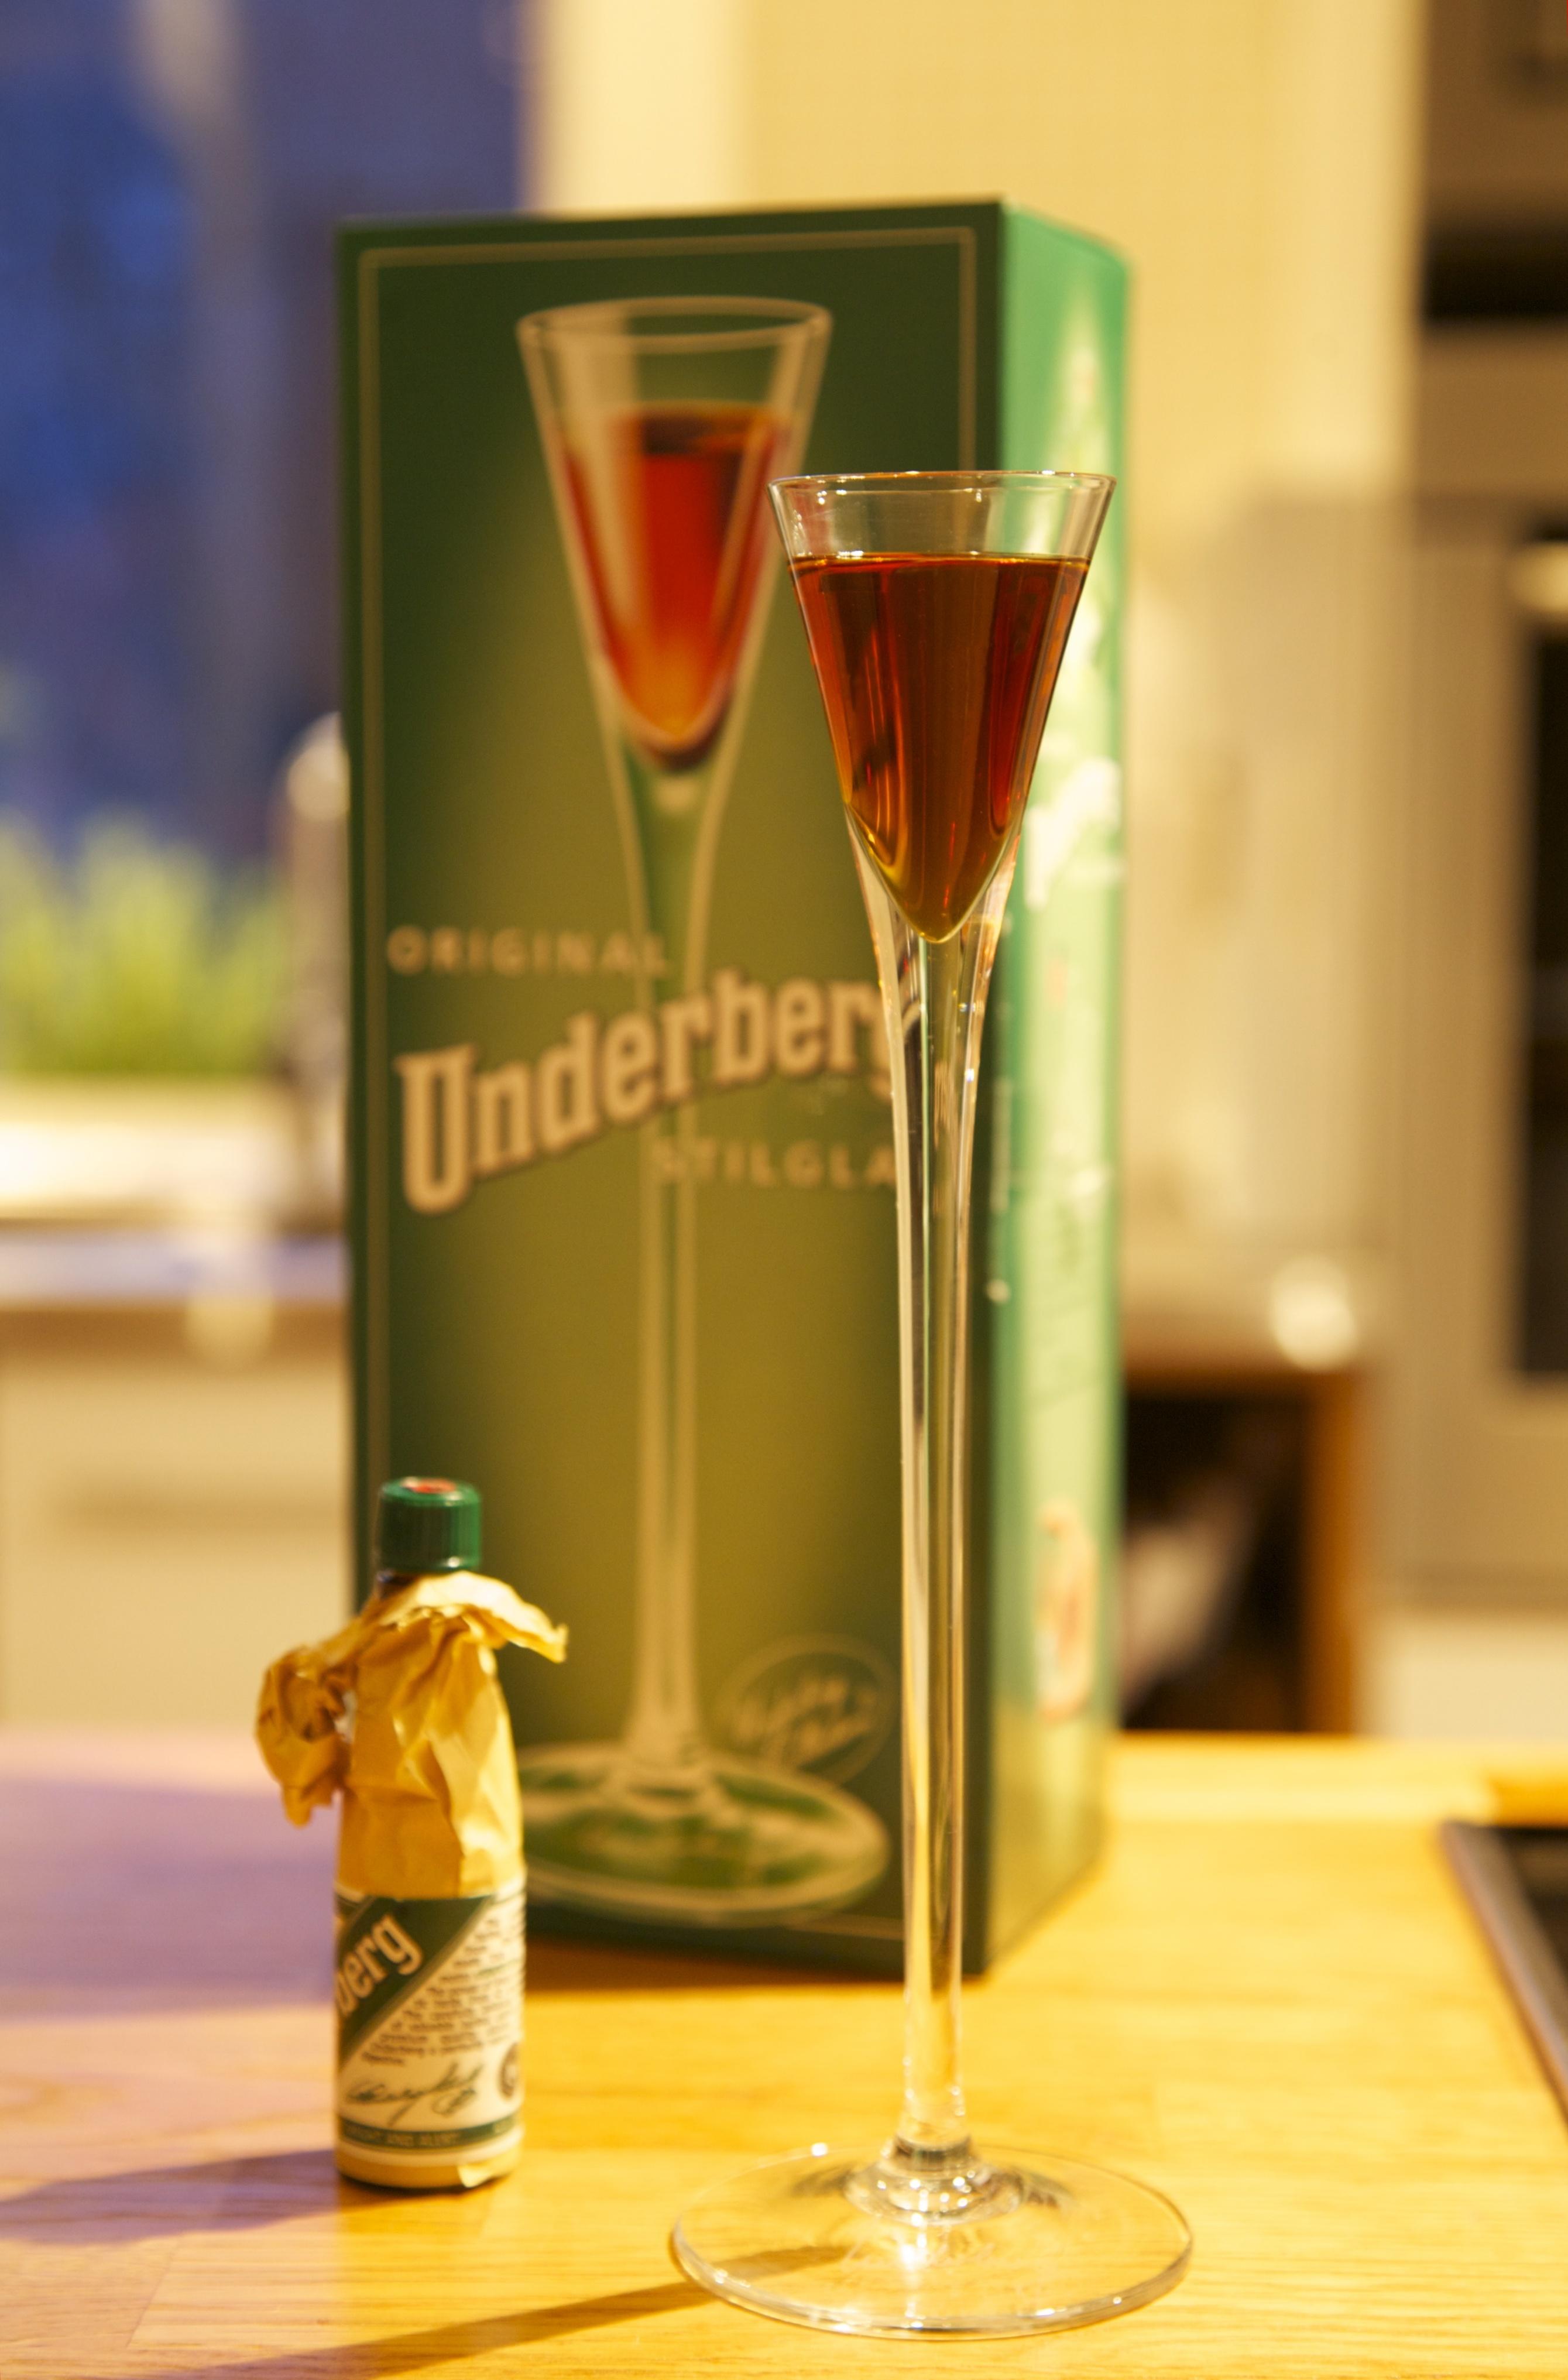 underberg  Underberg - Wikipedia